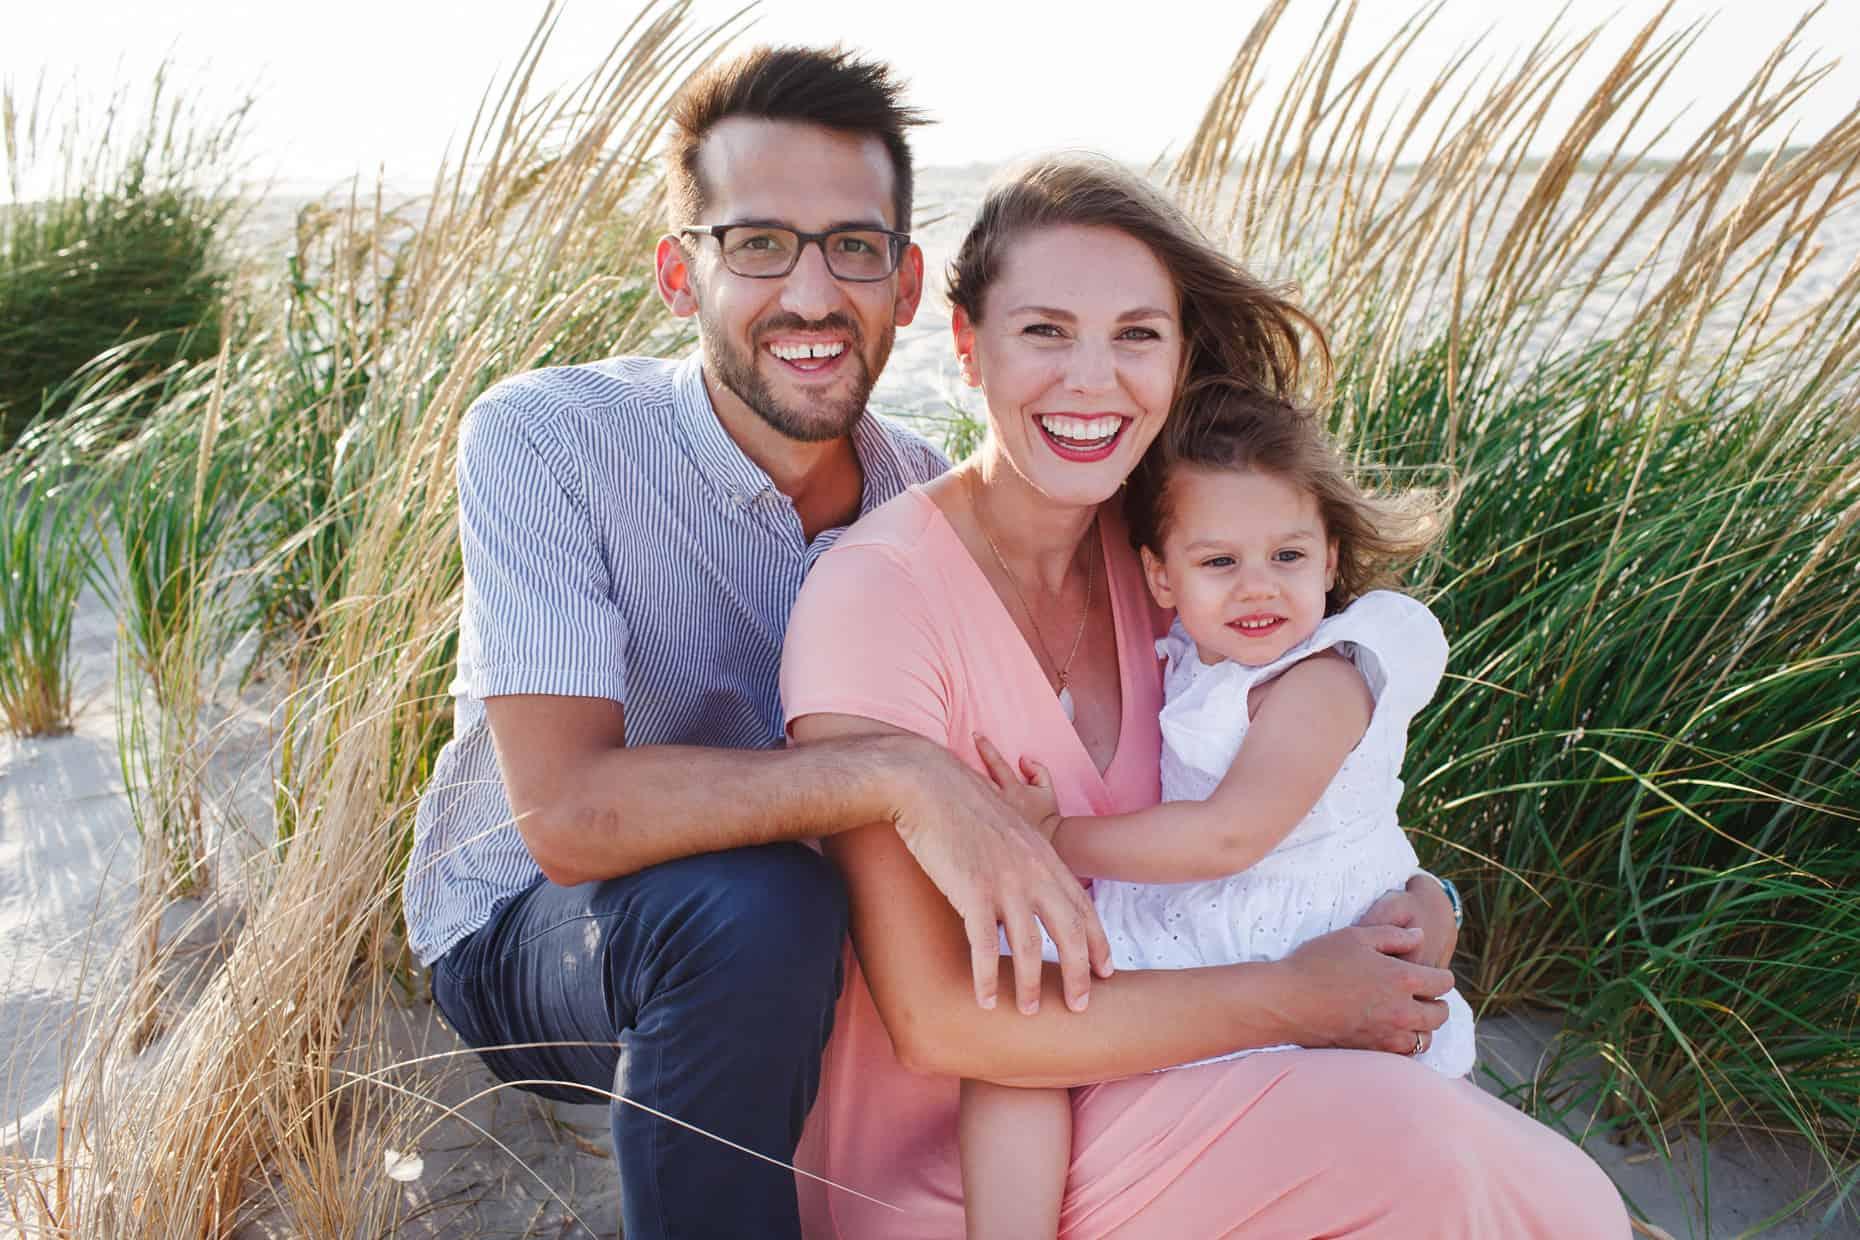 Family Photographer Cape May